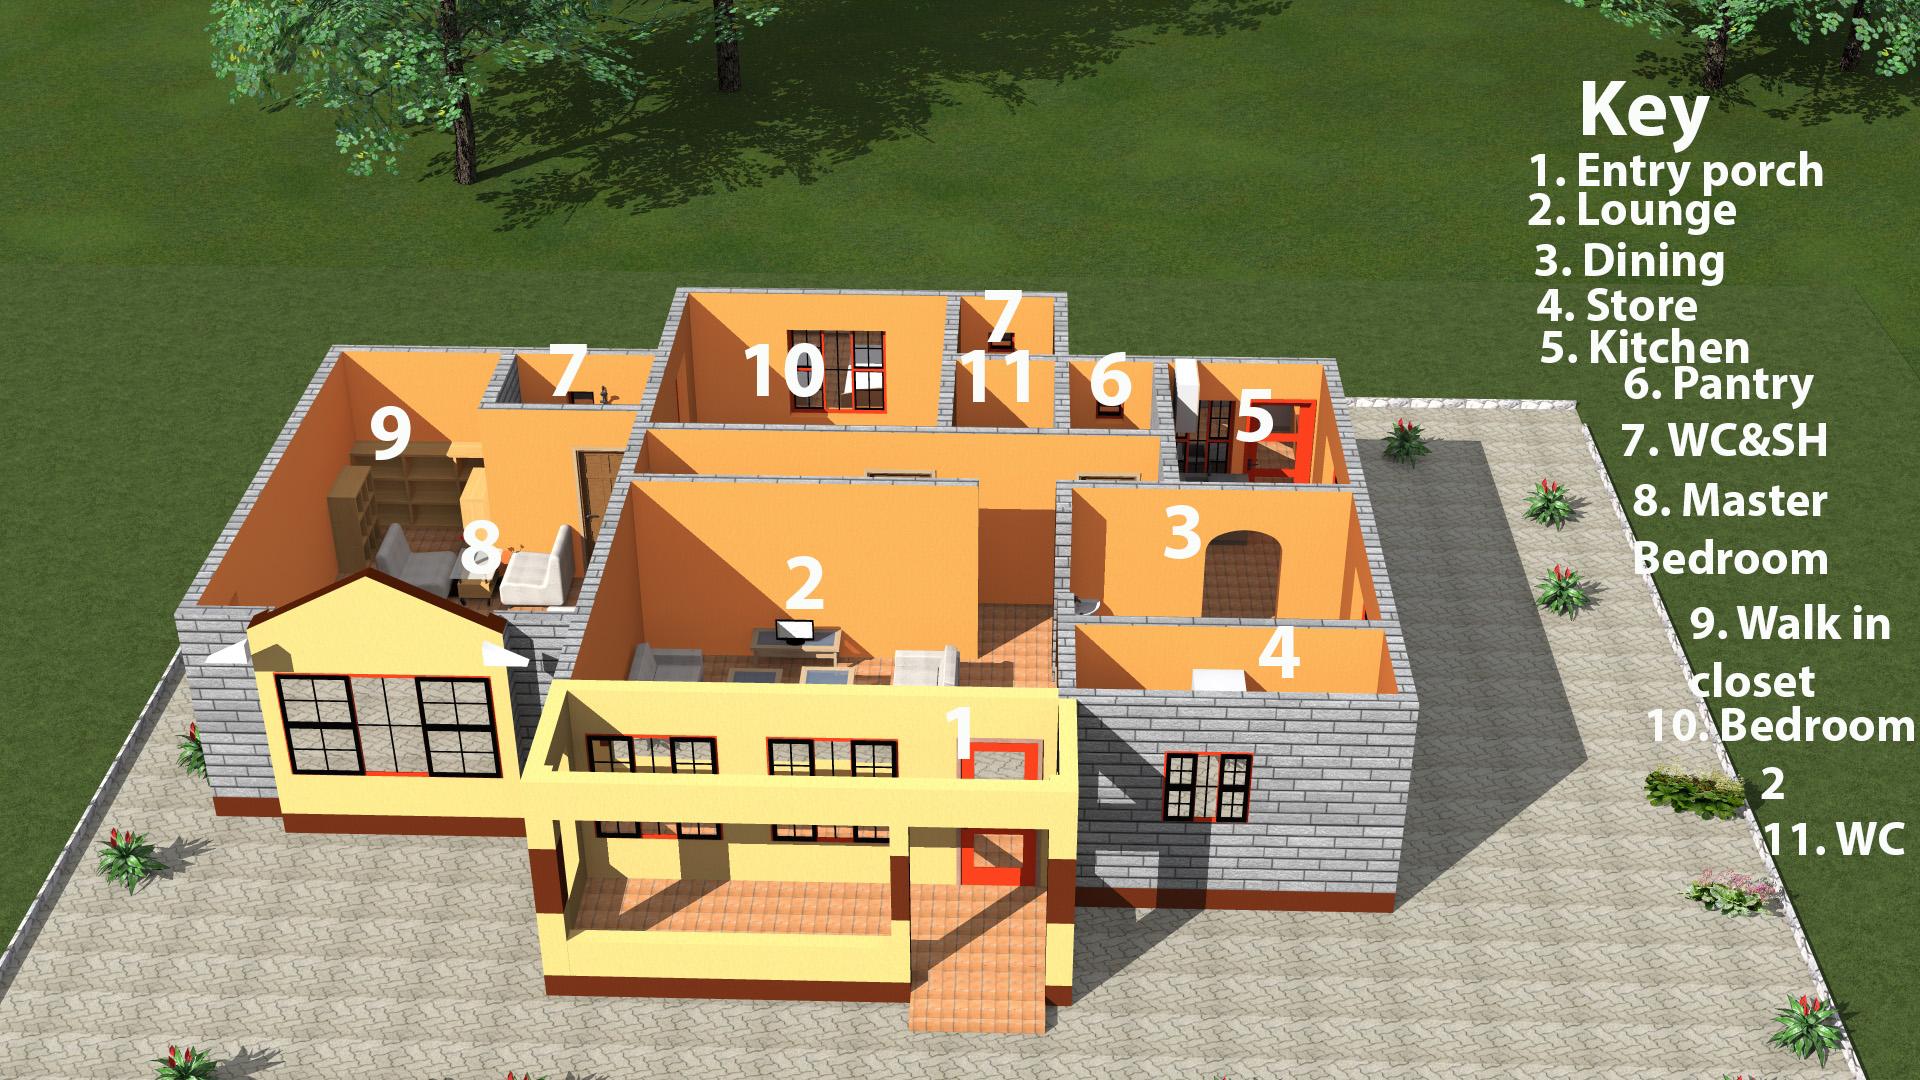 2 bedrooms gamble layout